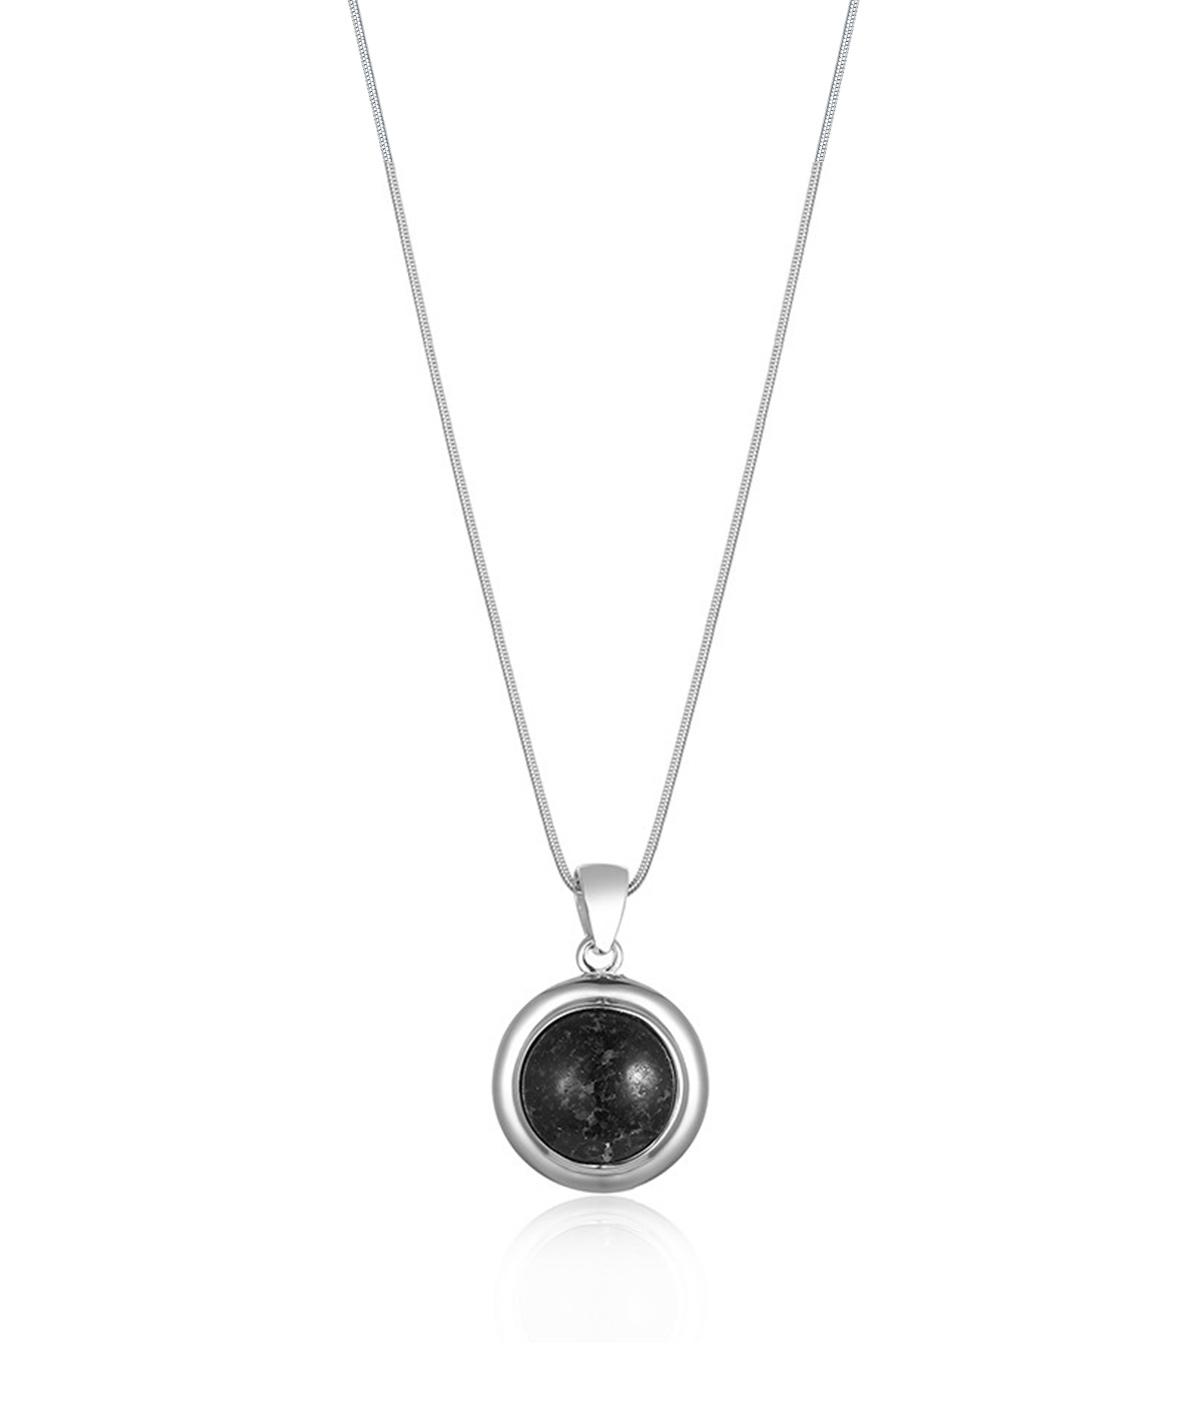 Round Granite Necklace